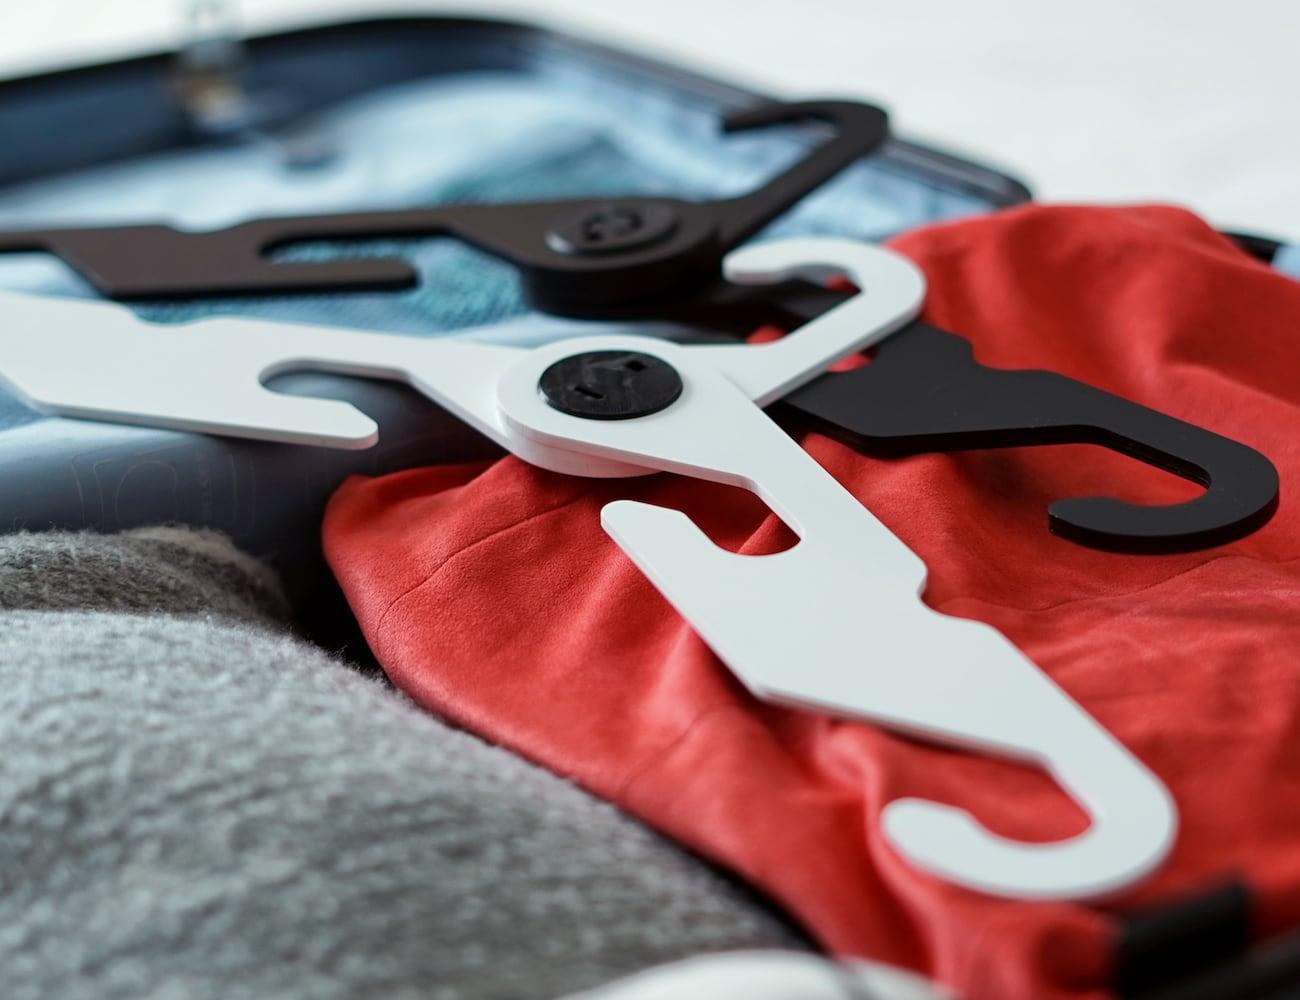 HandyHNGR Classy Foldable Hanger